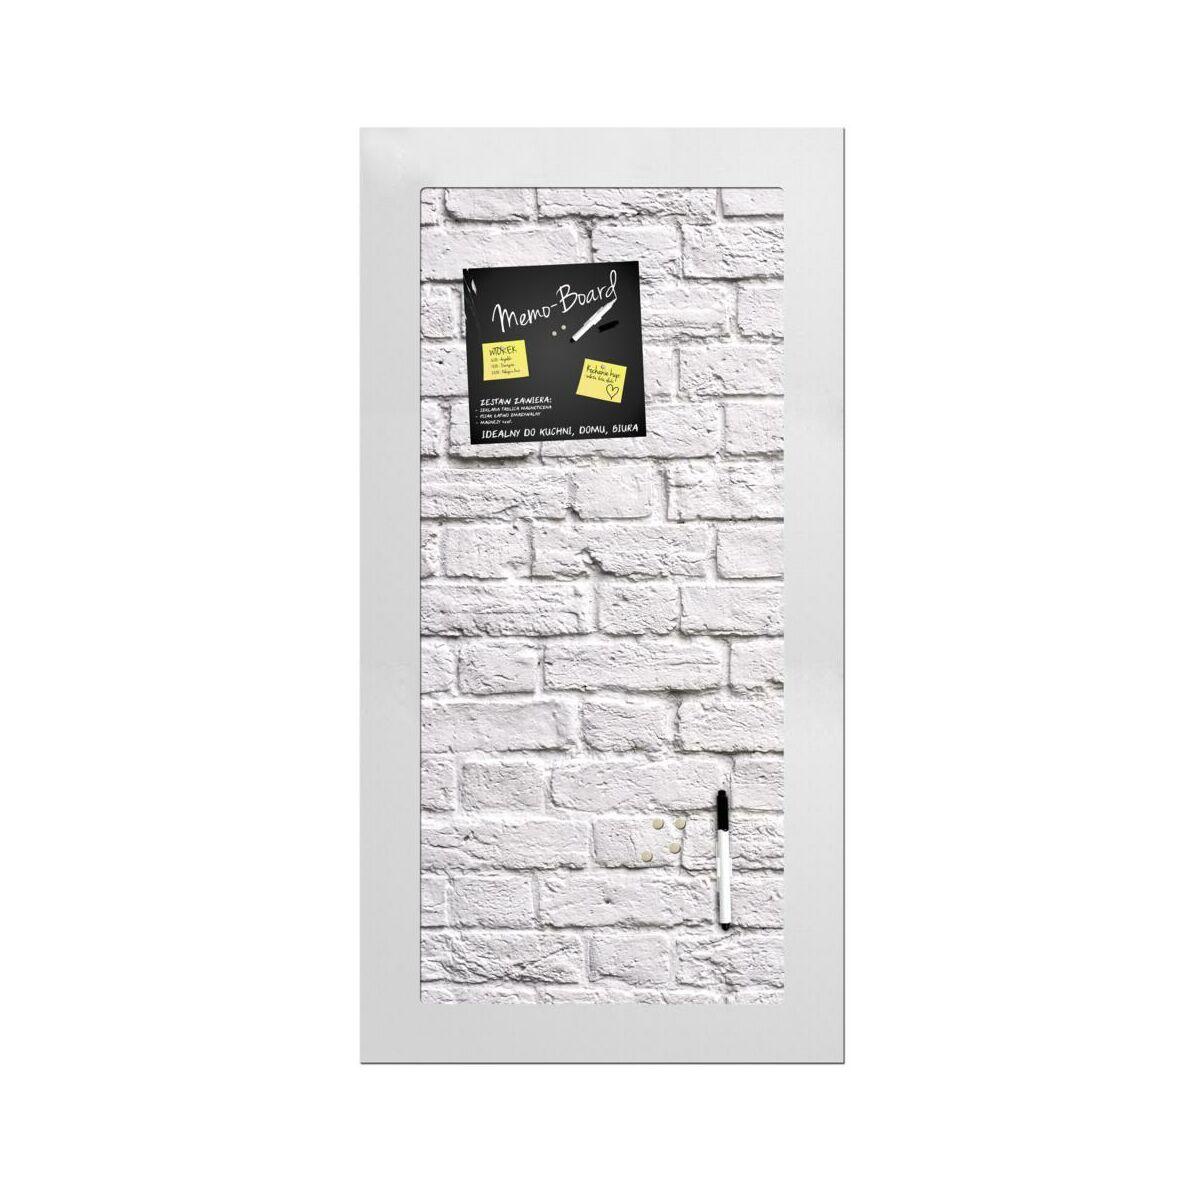 memoboard bia e ceg y 30 x 60 cm tablice memo i magnetyczne w atrakcyjnej cenie w sklepach. Black Bedroom Furniture Sets. Home Design Ideas